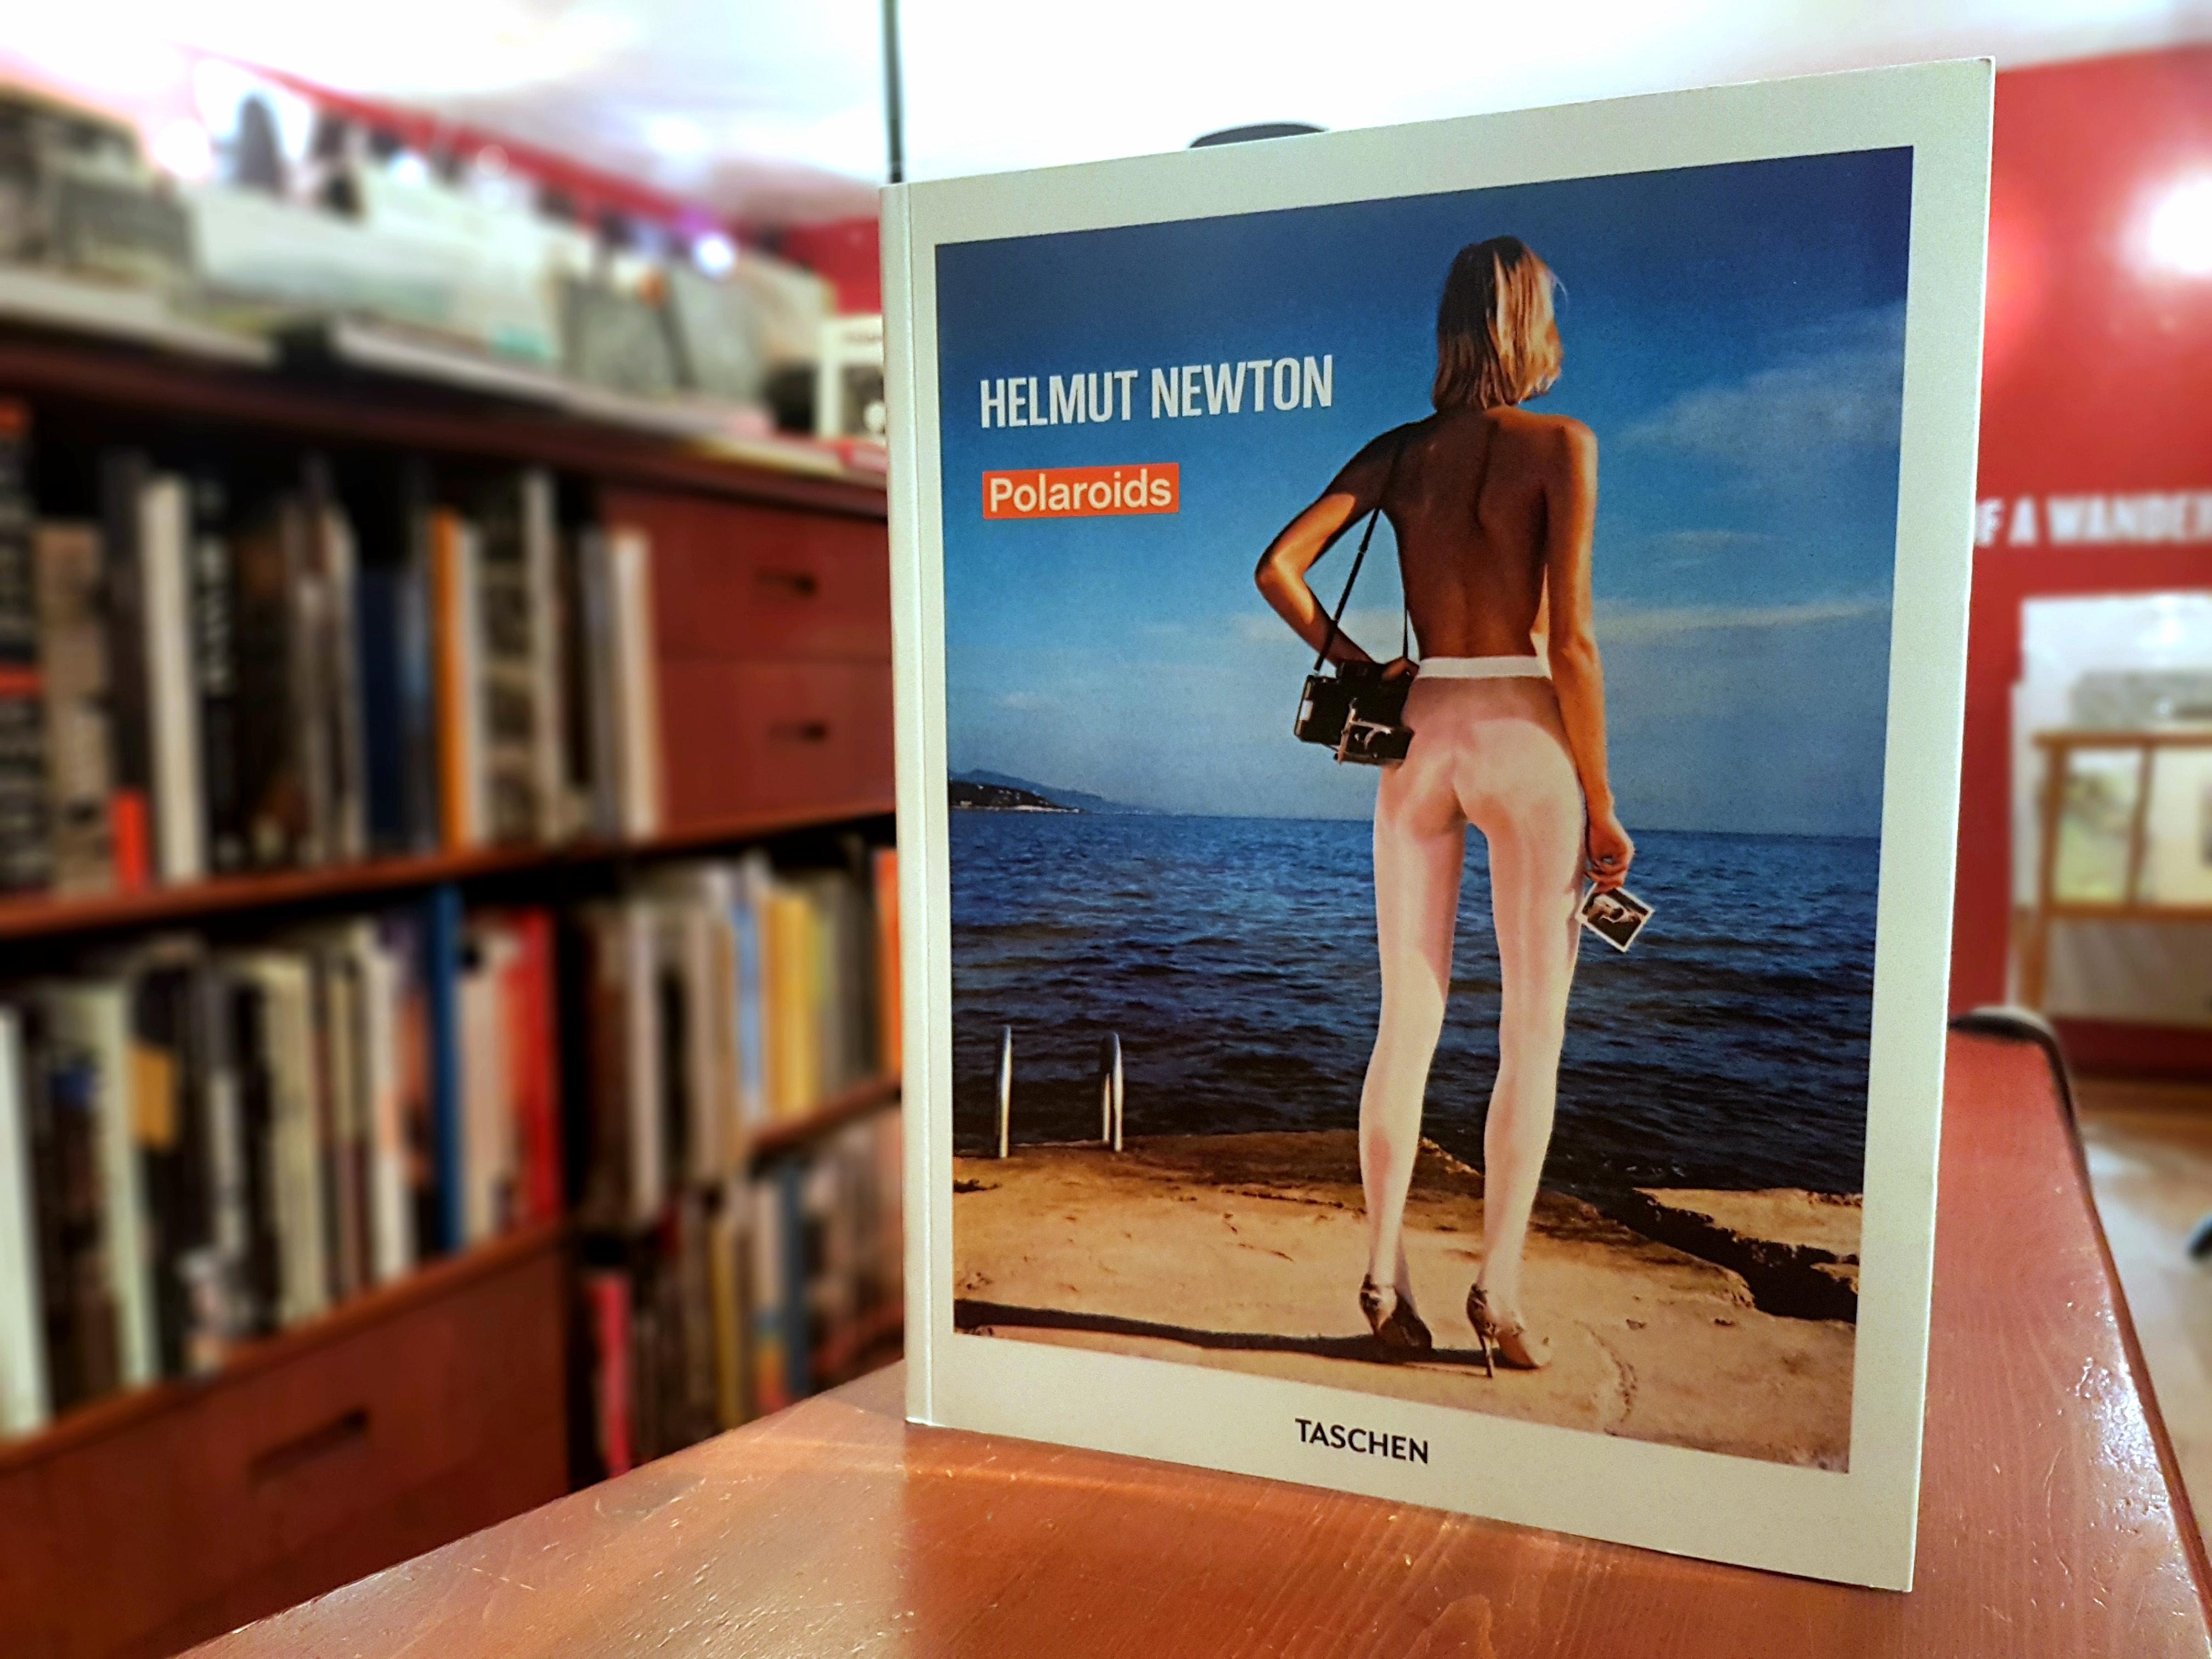 Polaroids. Helmut Newton